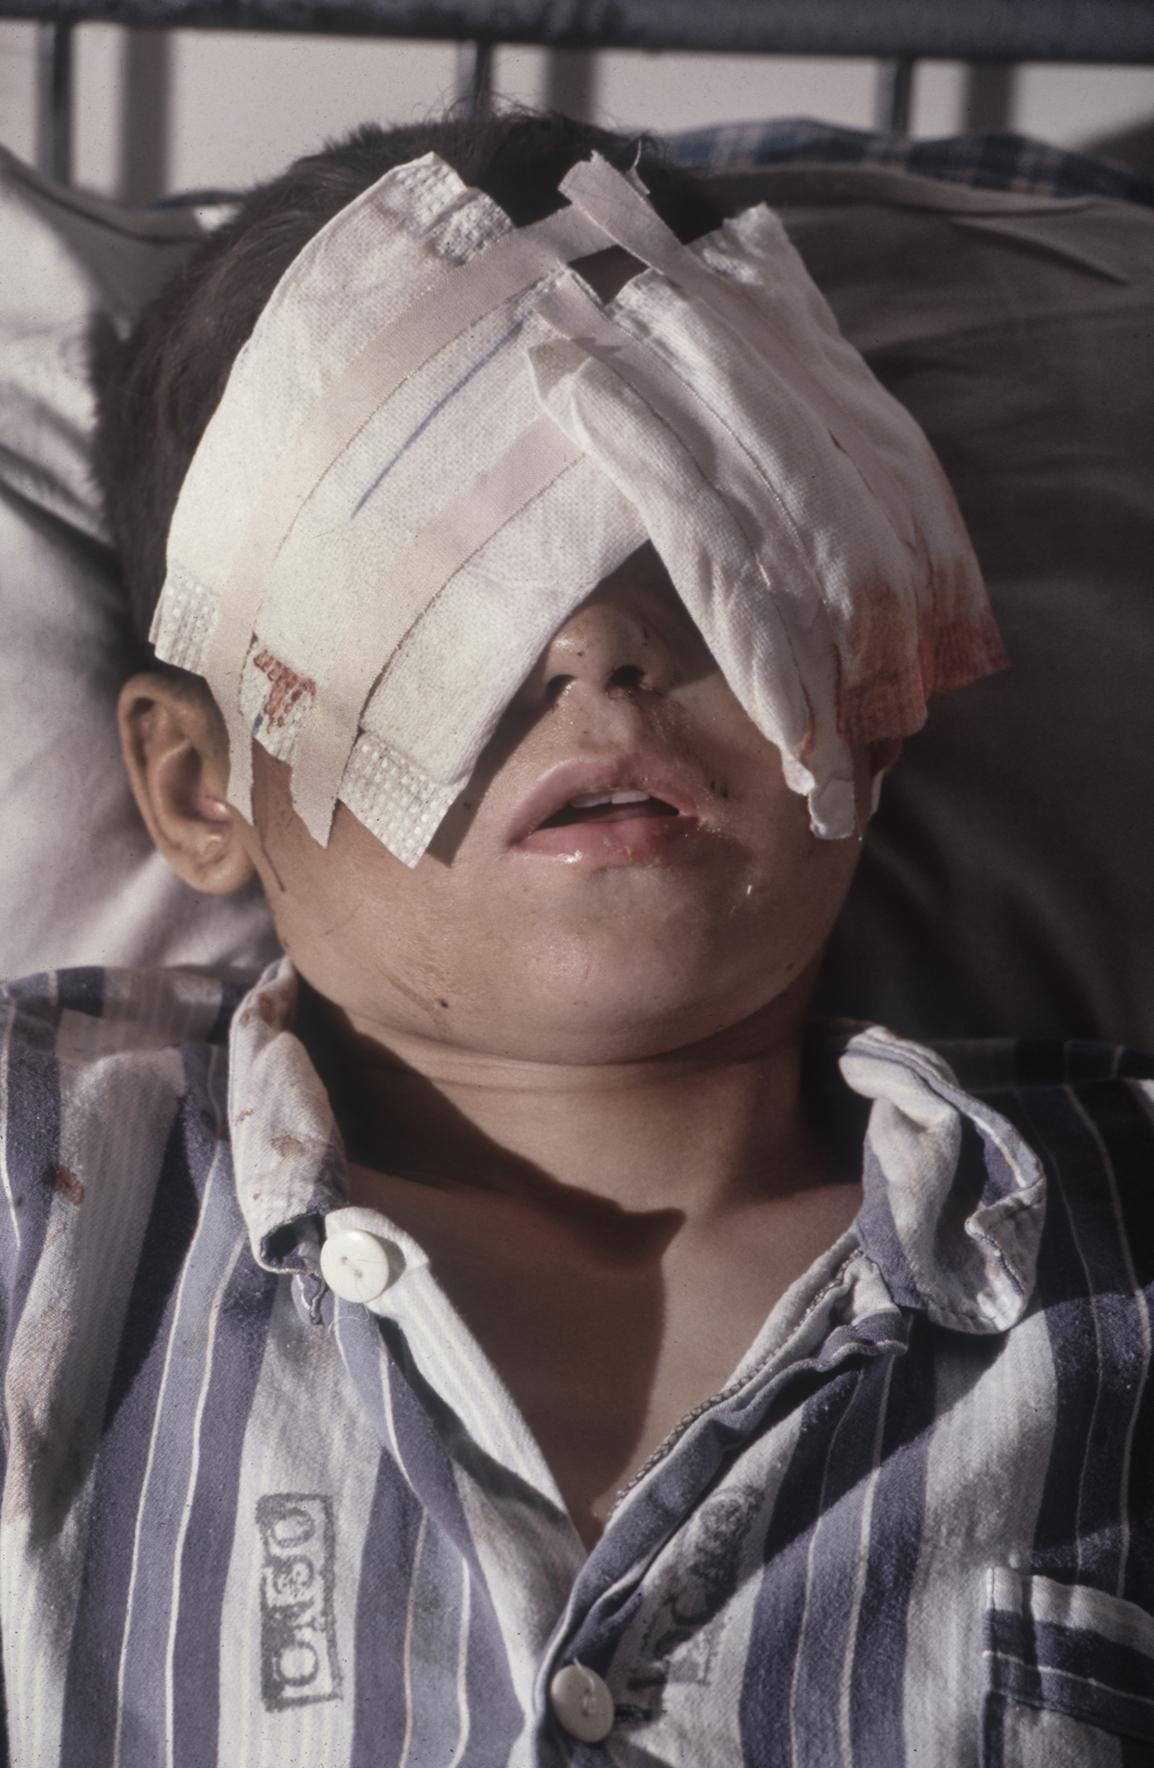 Sead Bekric in a hospital in Tuzla, Bosnia-Herzegovina, after Serb fire blinded him in the Muslim held enclave of Srebrenica. 1993